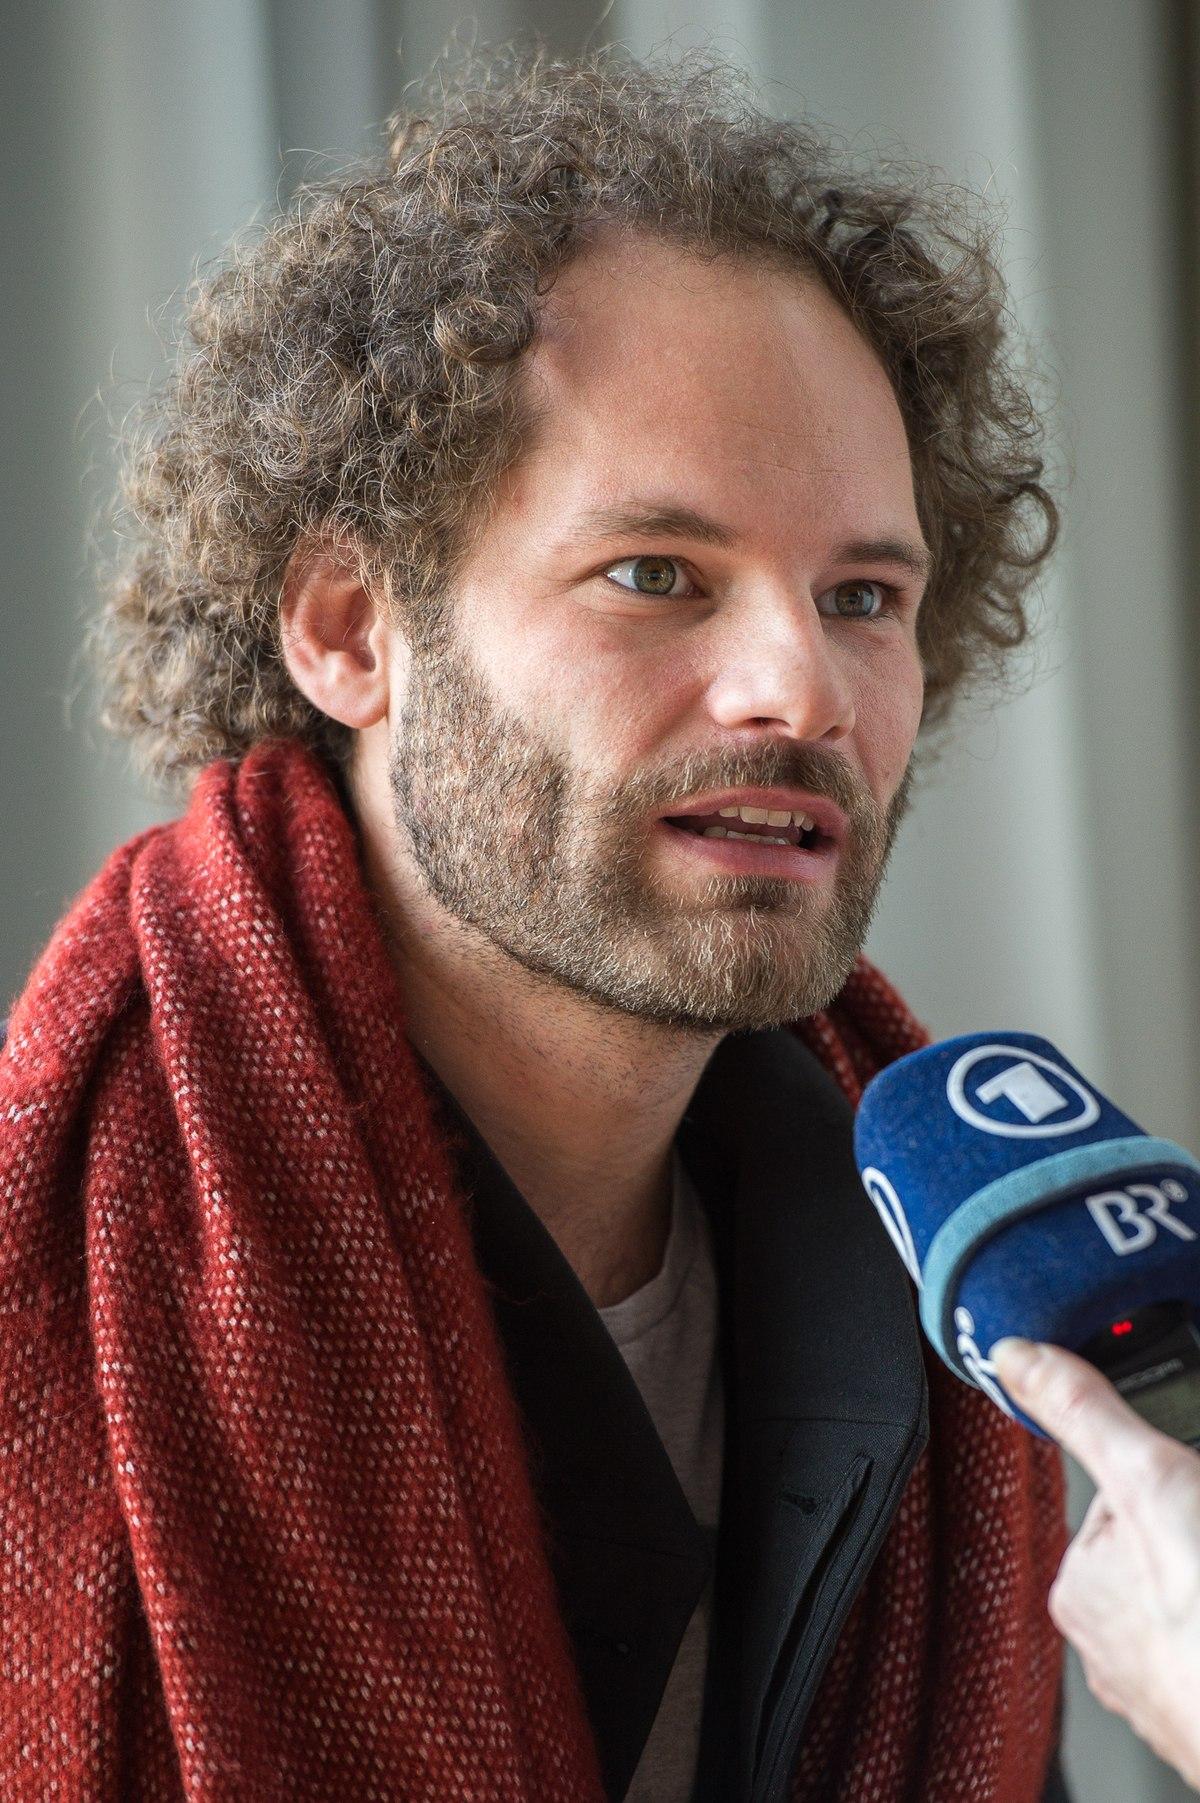 Maxi Schaffroth